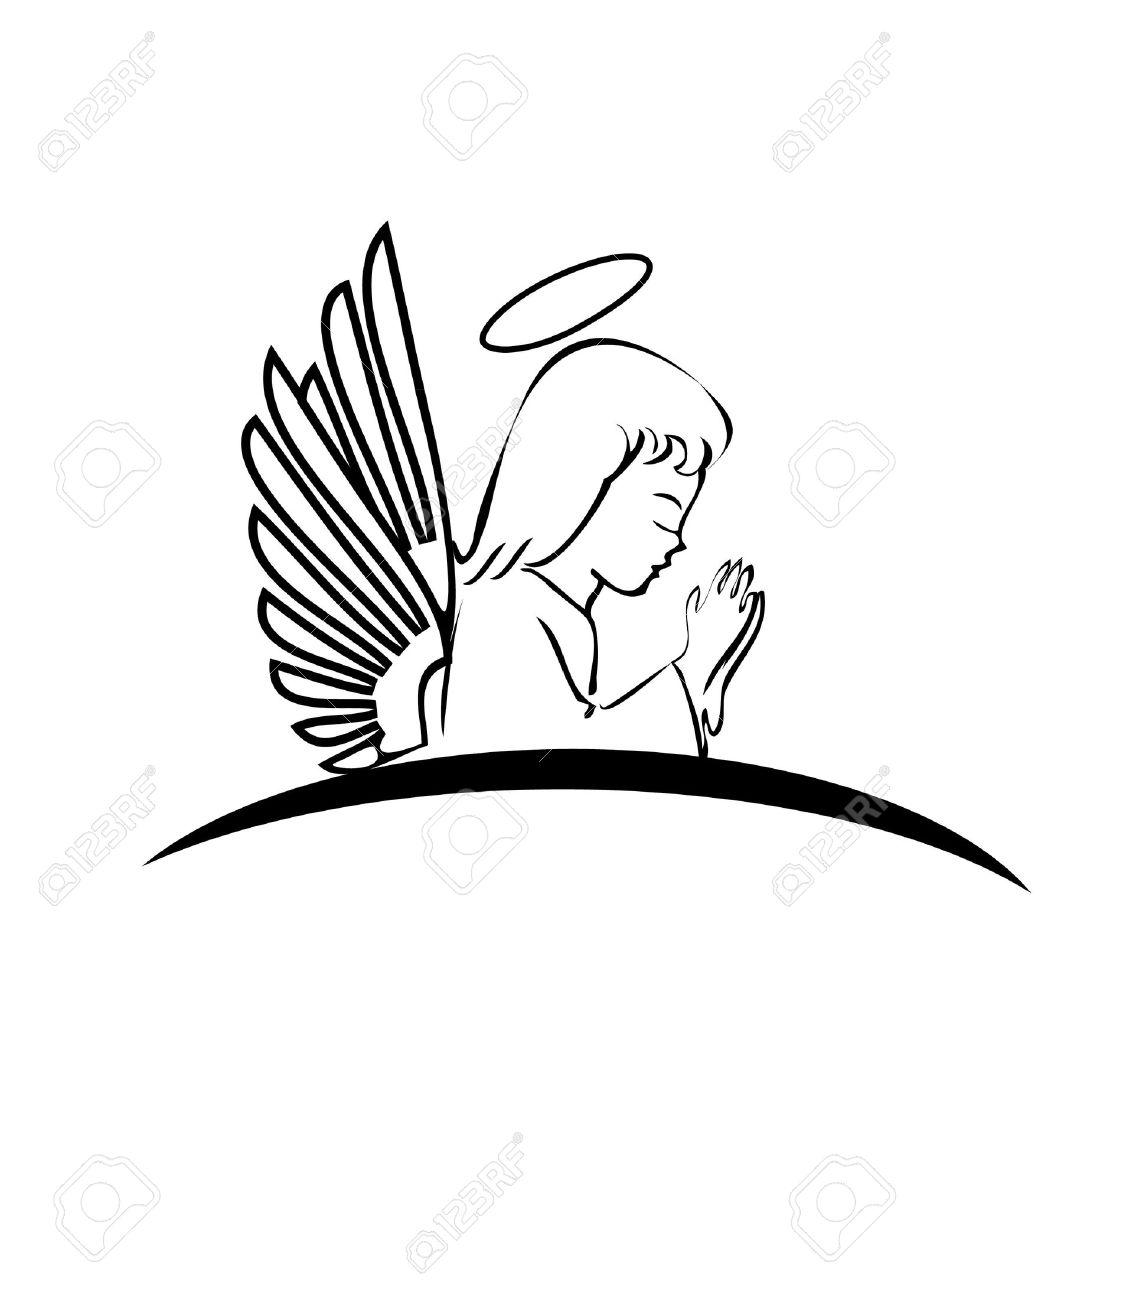 1126x1300 Angel Praying Logo Royalty Free Cliparts, Vectors, And Stock